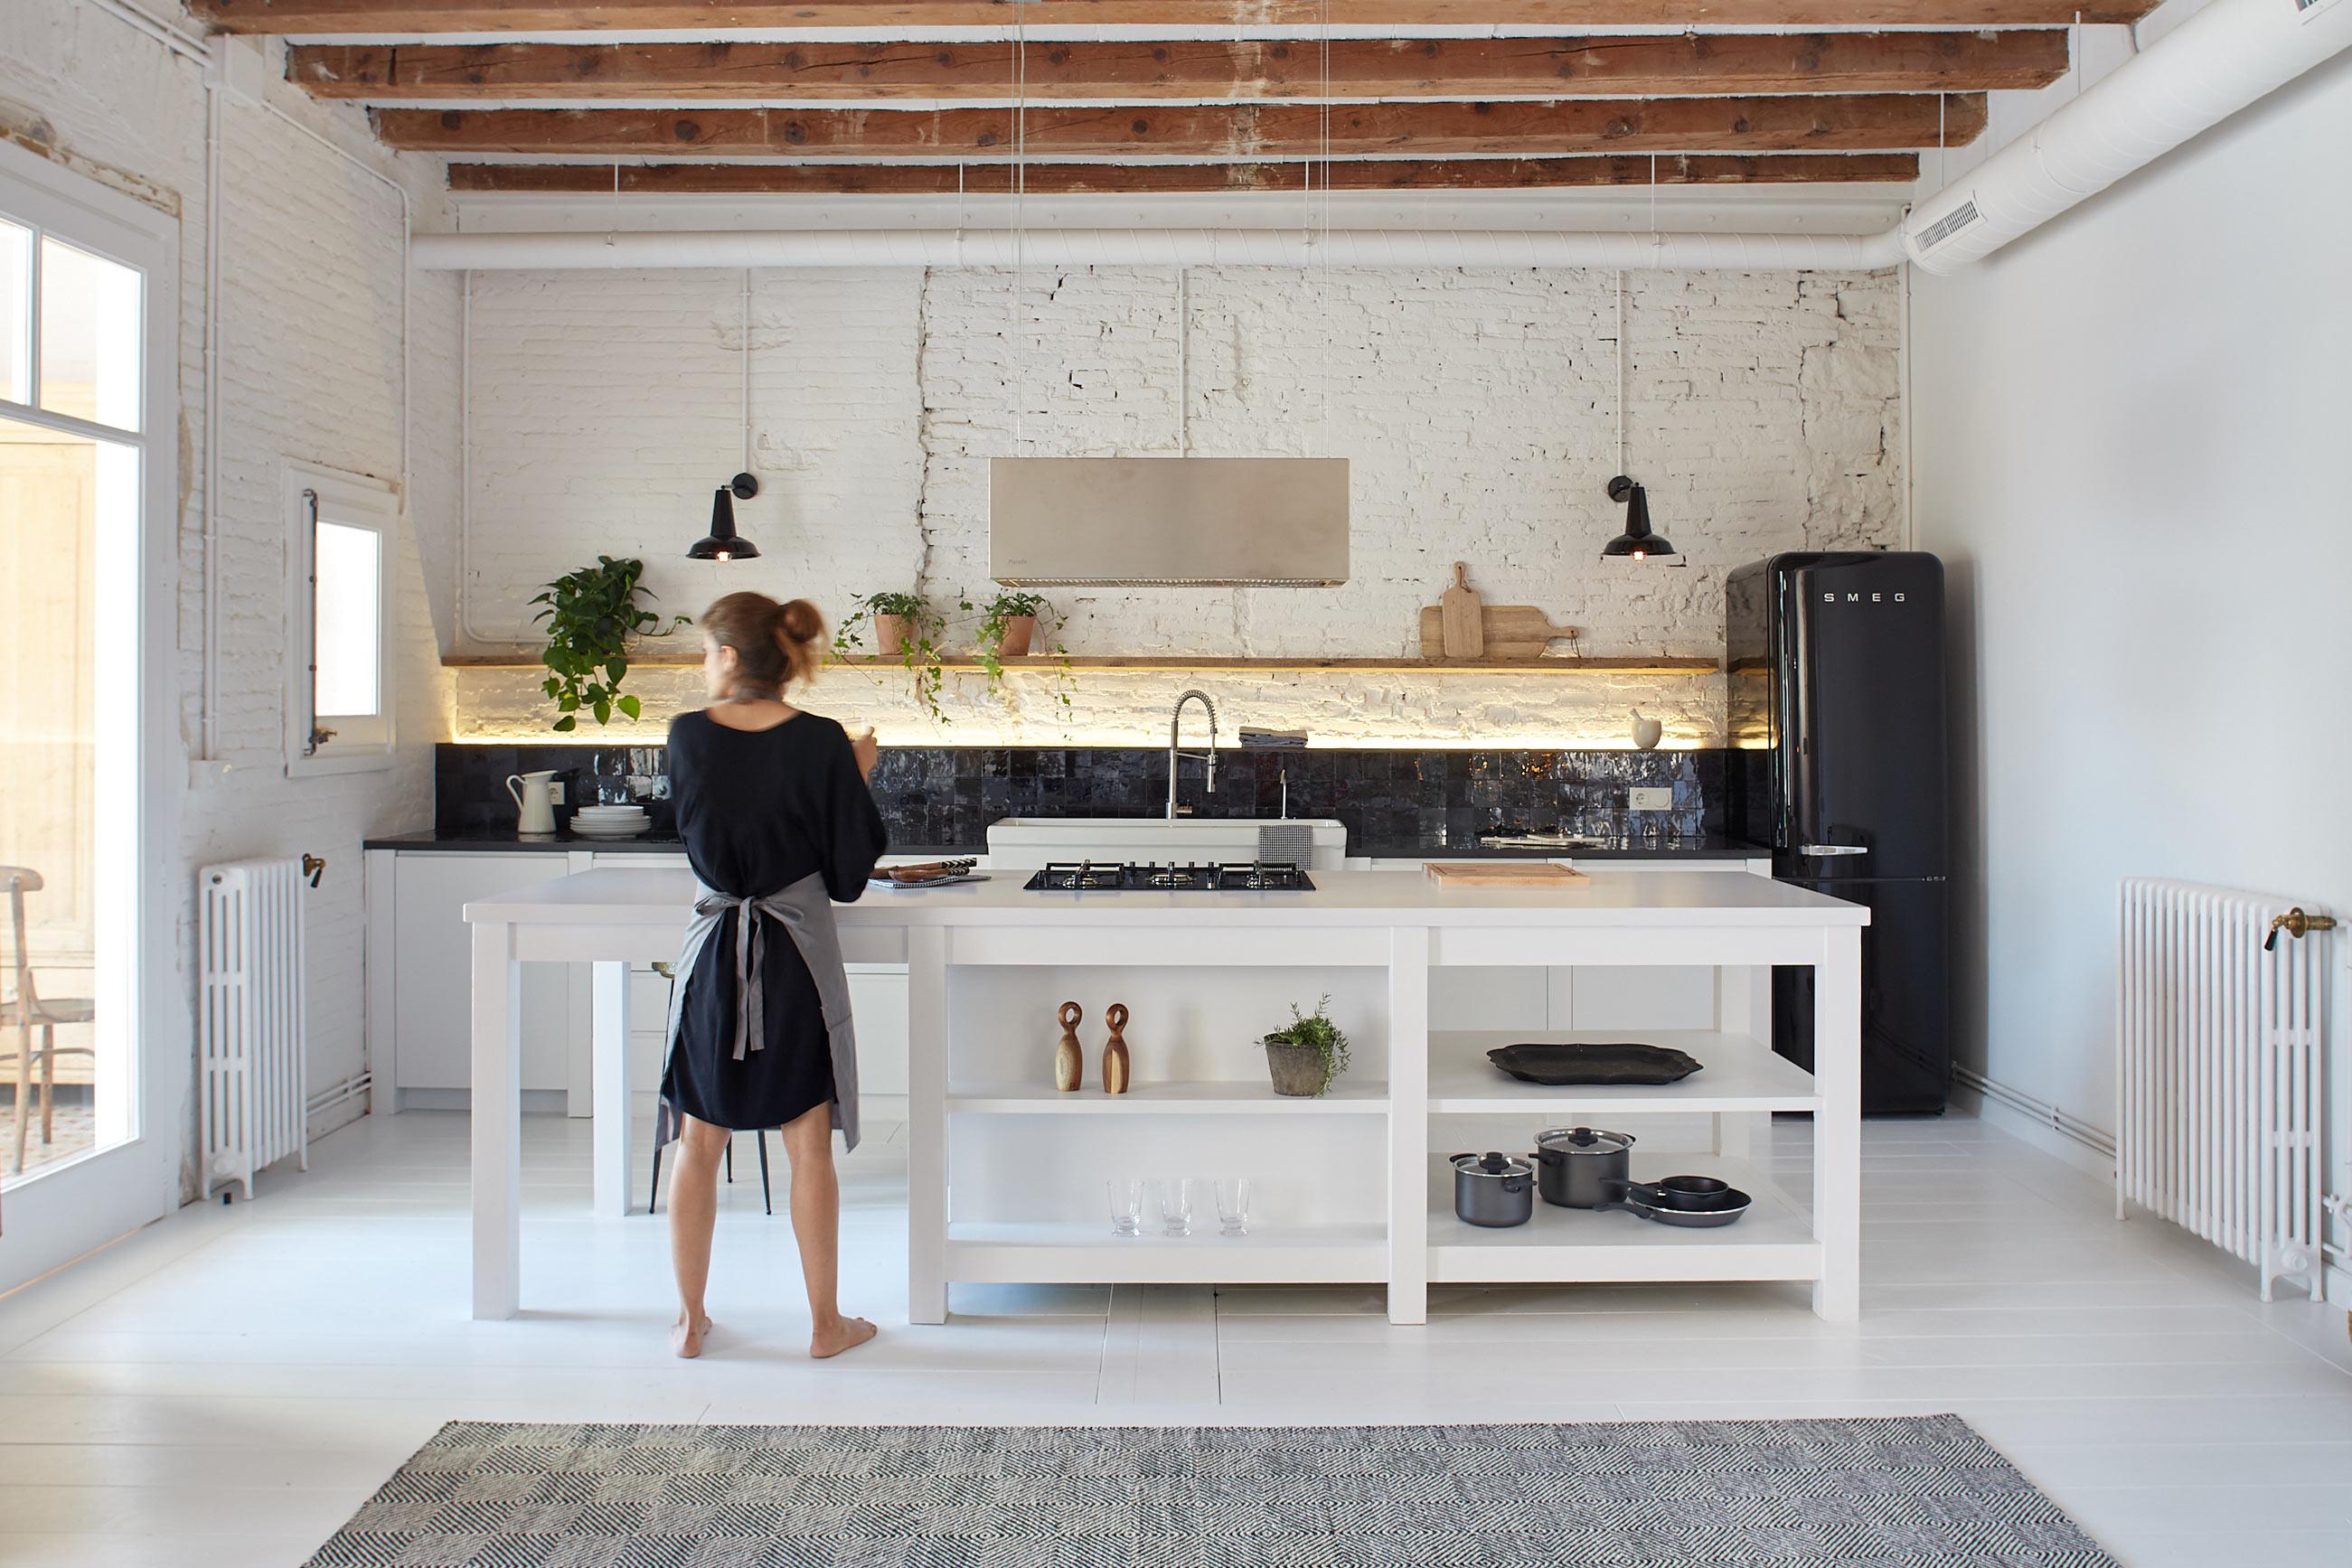 marta-castellano-mas-interiorista-barcelona-manresa-interiorisme-interiorismo-decoracion-nordic-kitchen-industrial